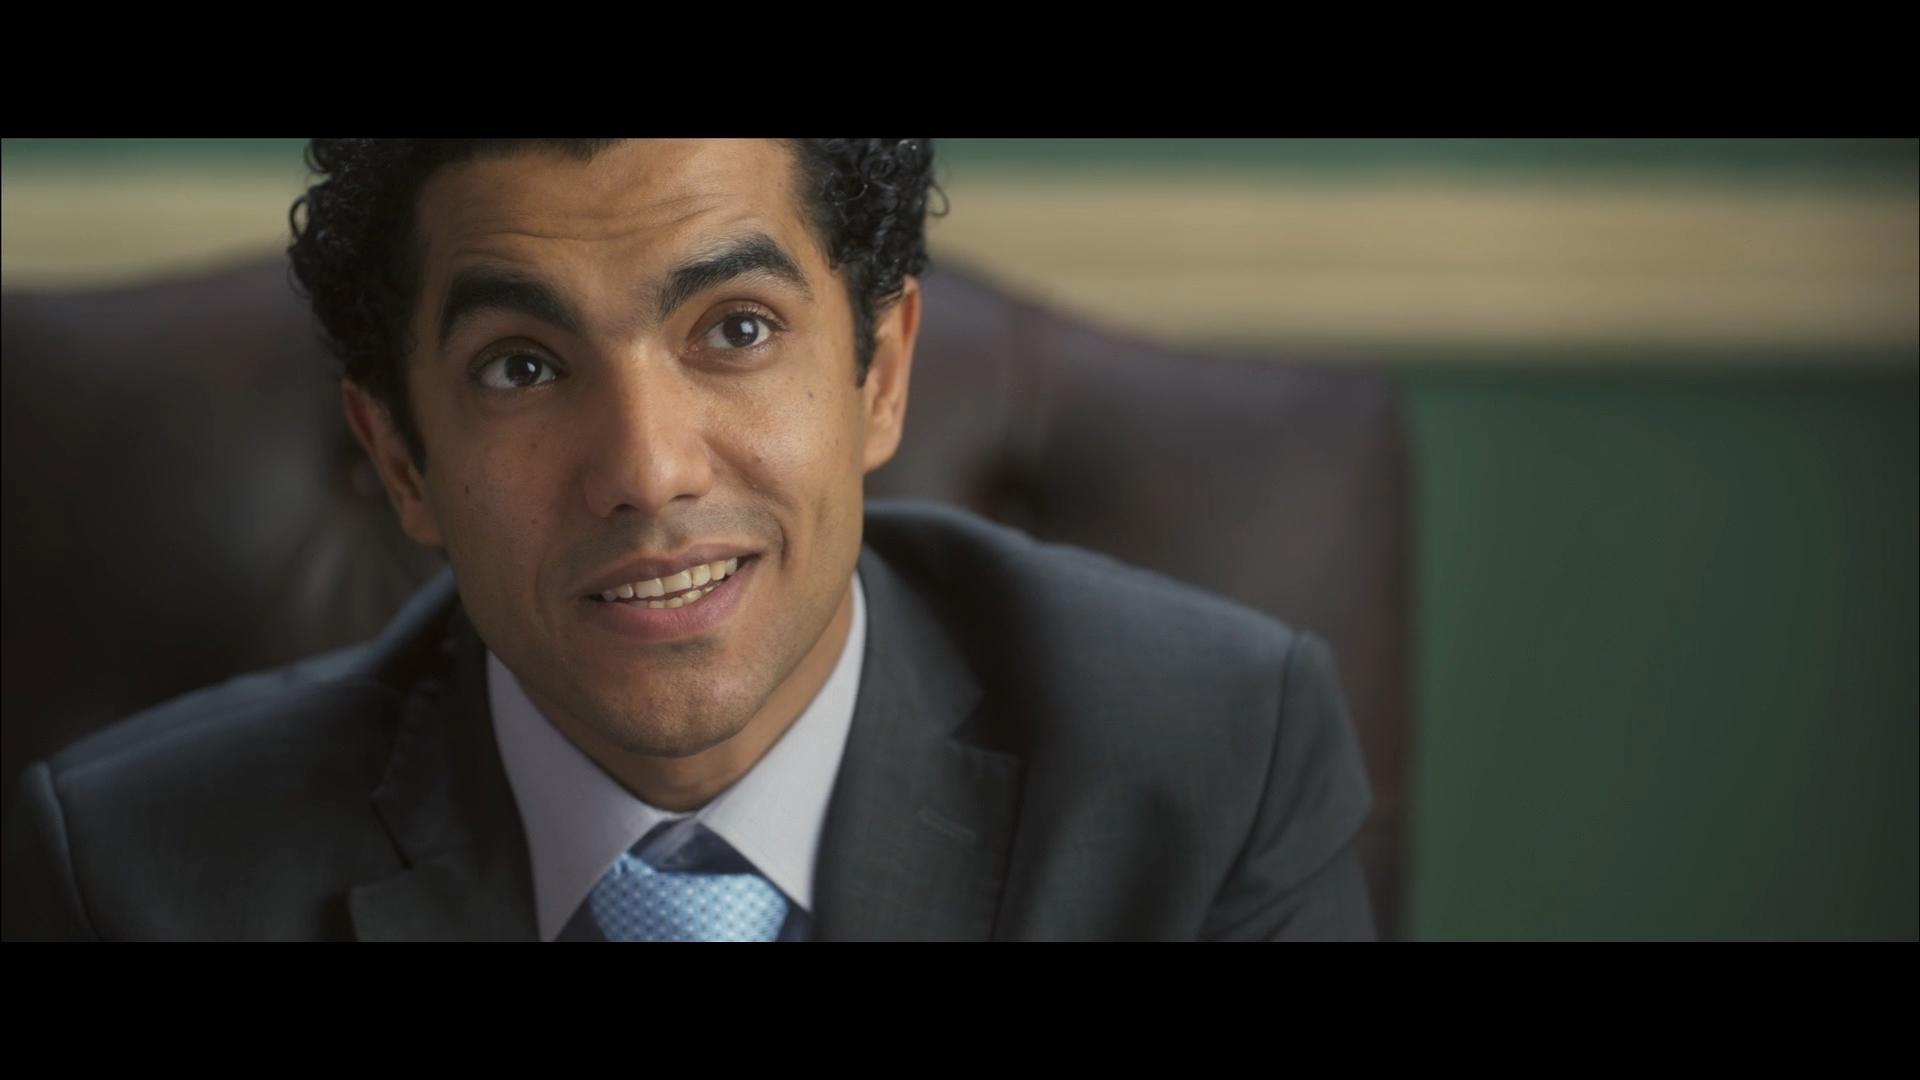 [فيلم][تورنت][تحميل][هروب اضطراري][2017][1080p][Web-DL] 10 arabp2p.com